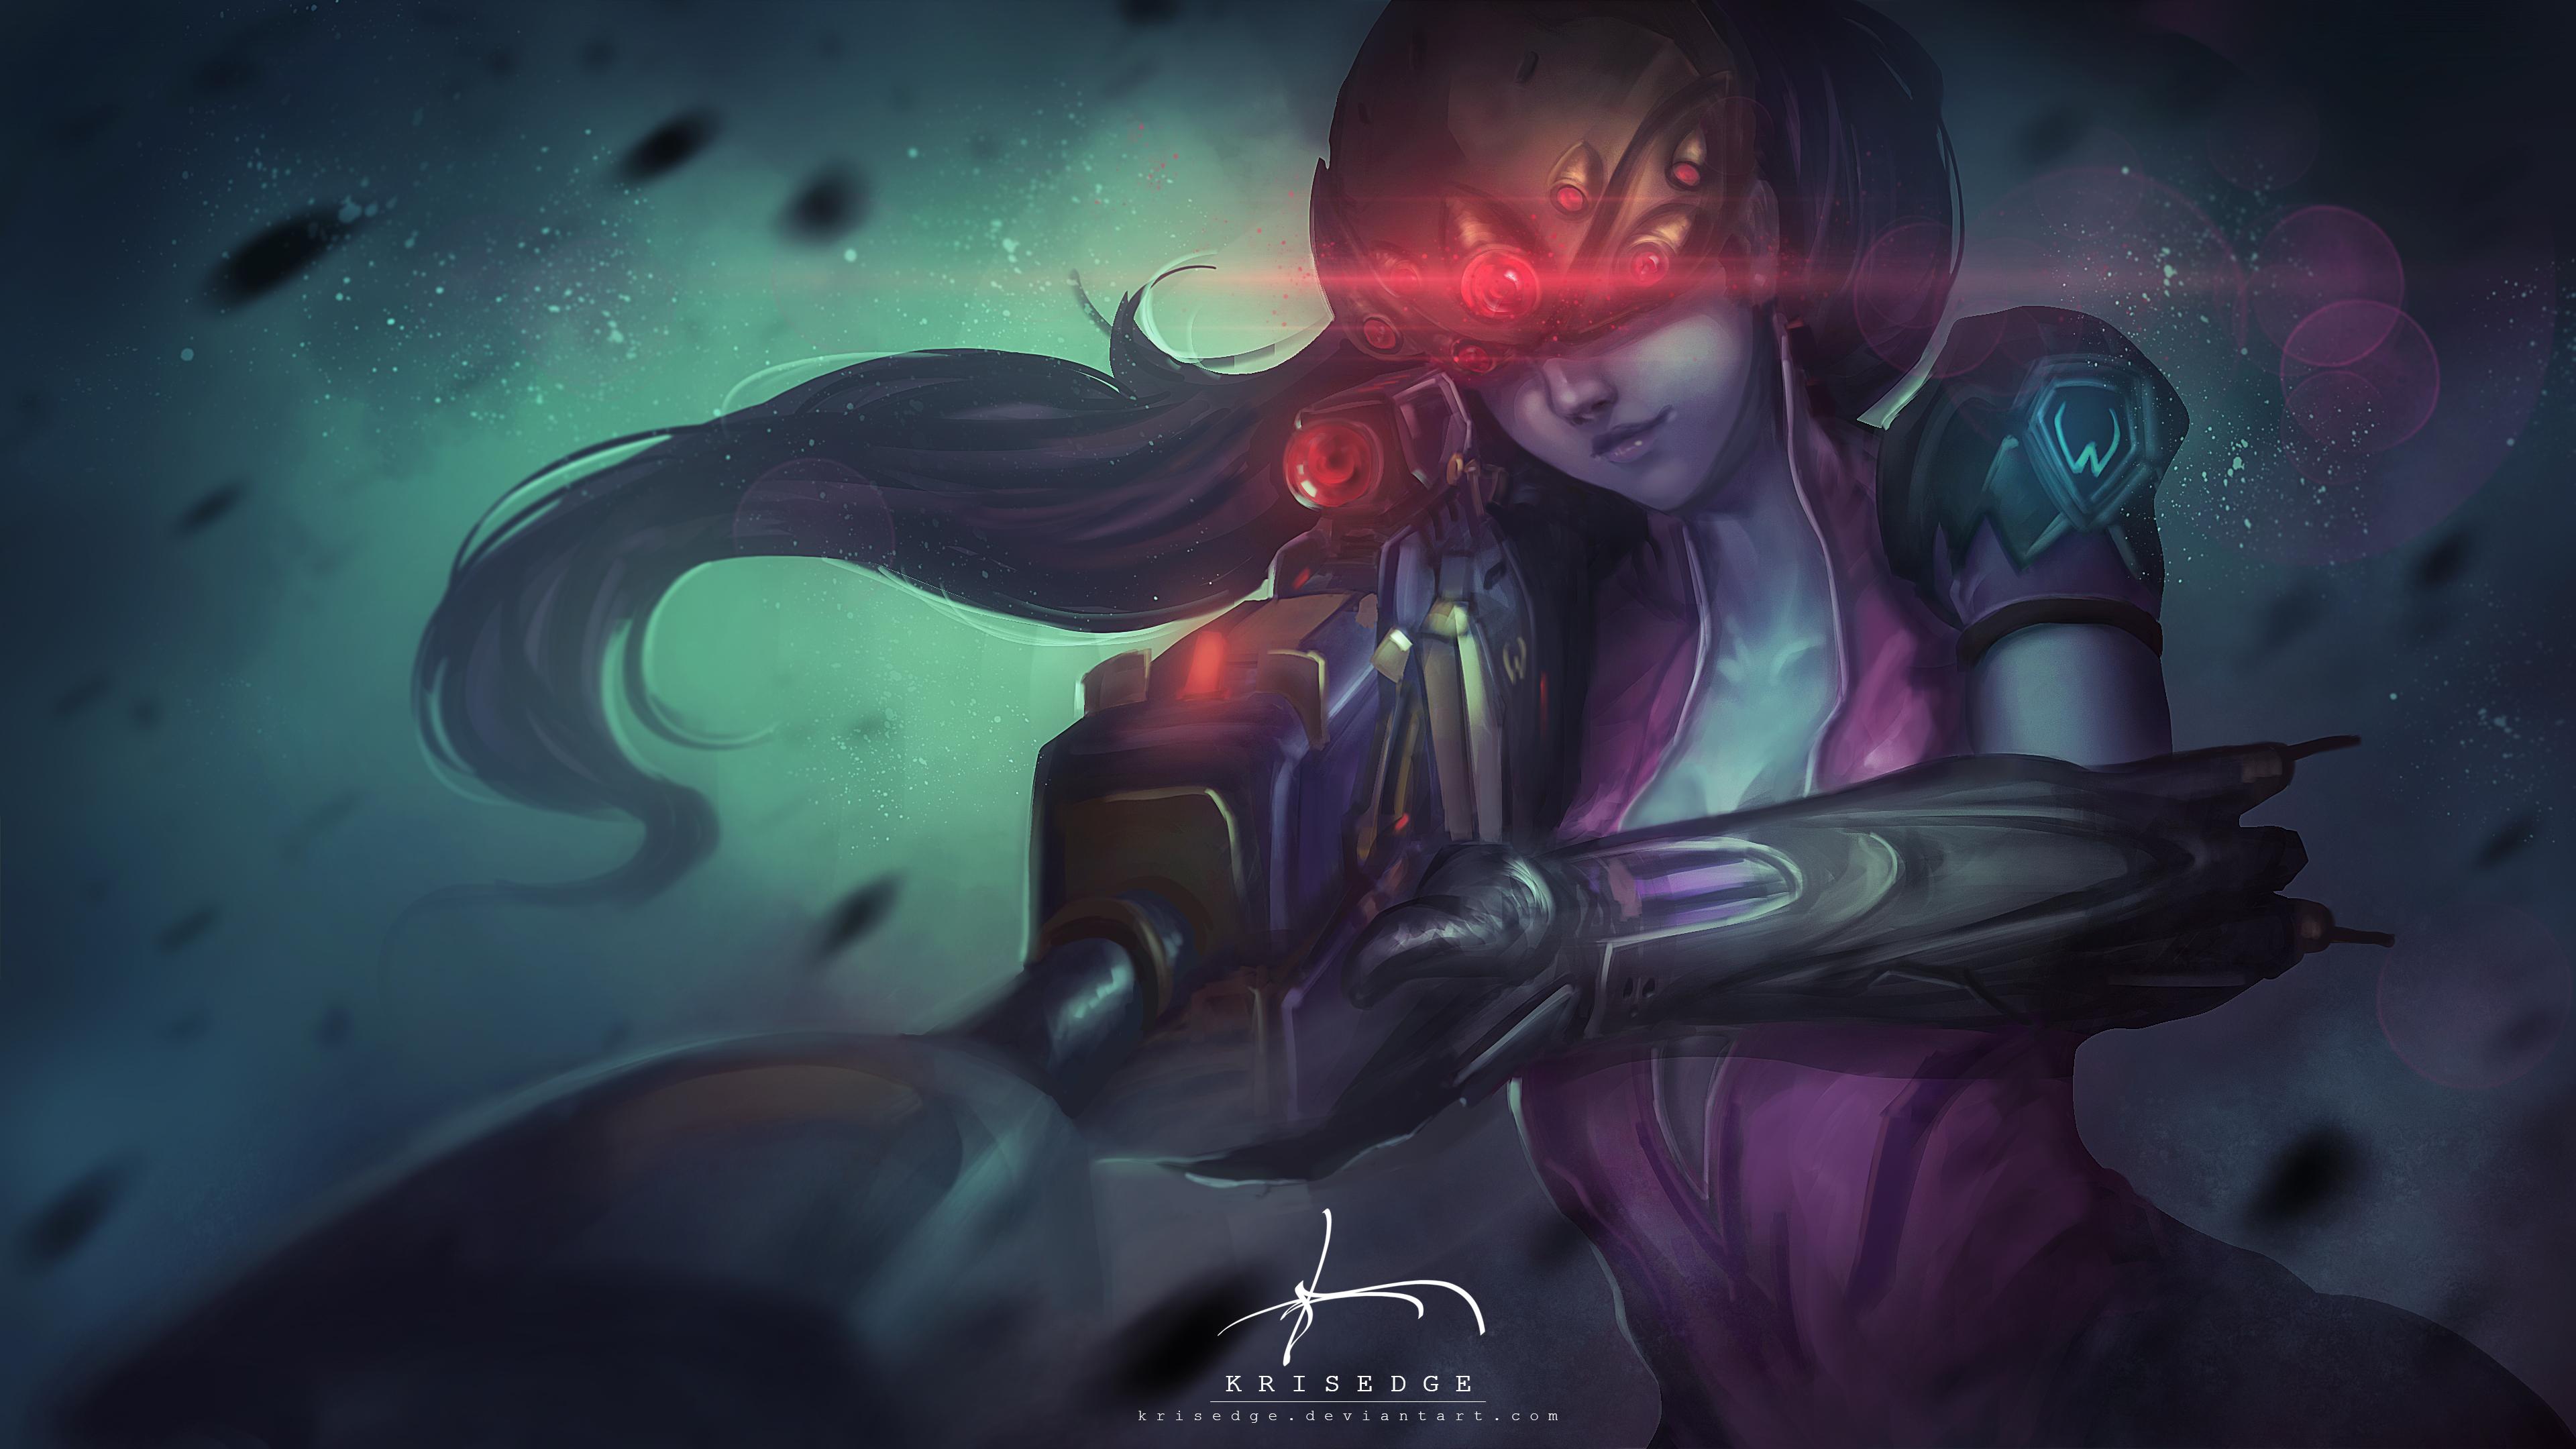 Widowmaker Overwatch 4k Ultra Hd Wallpaper Background Image